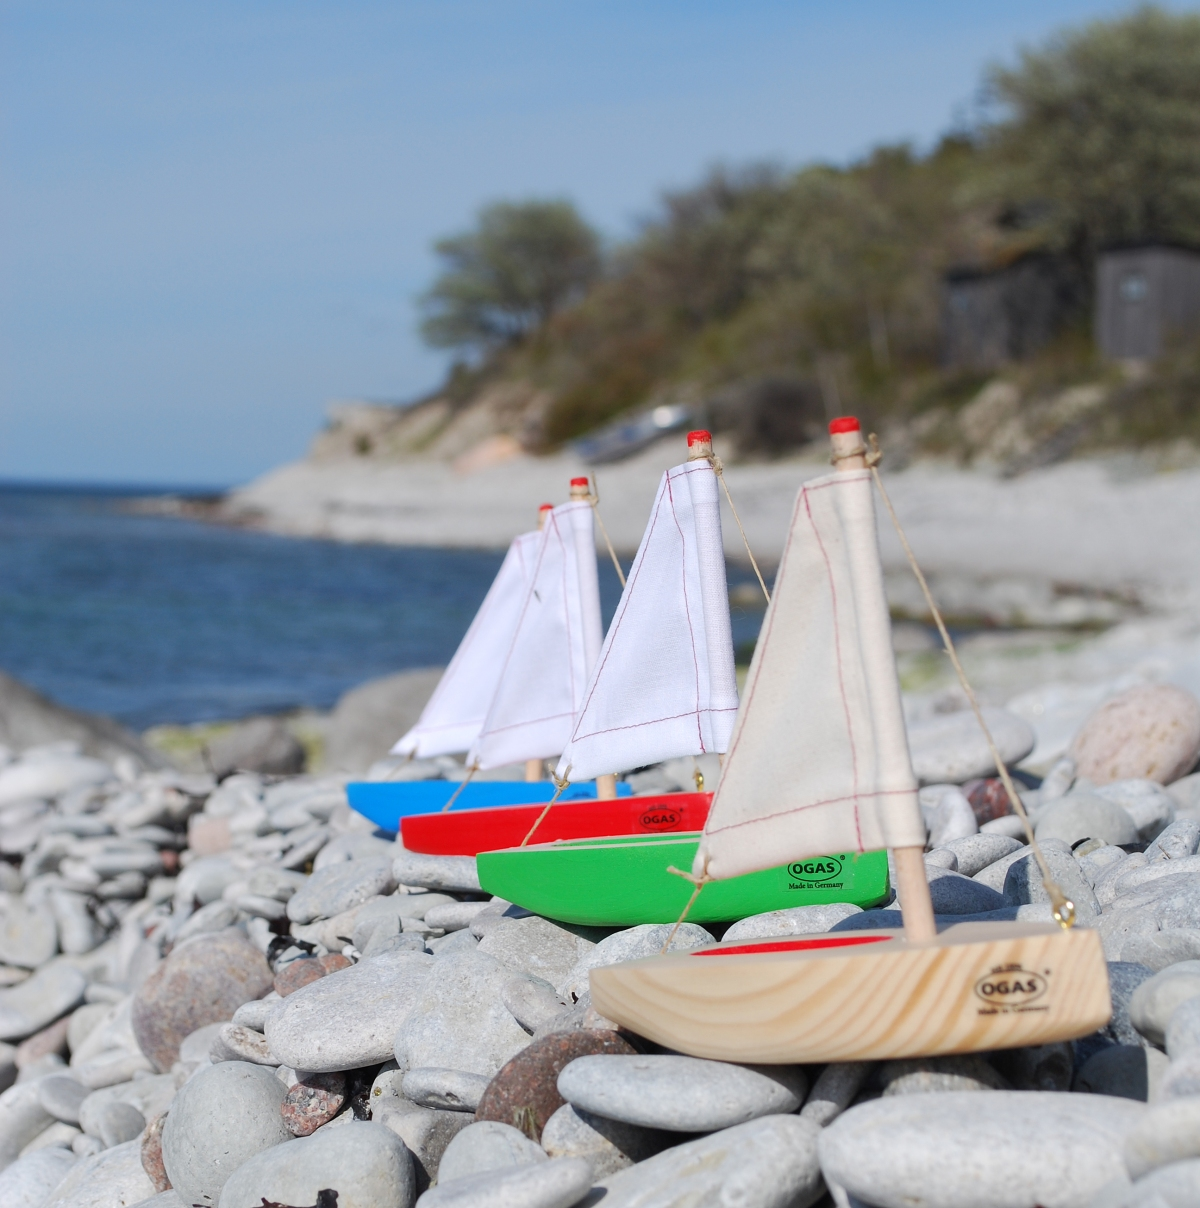 Sommarens segelskepp